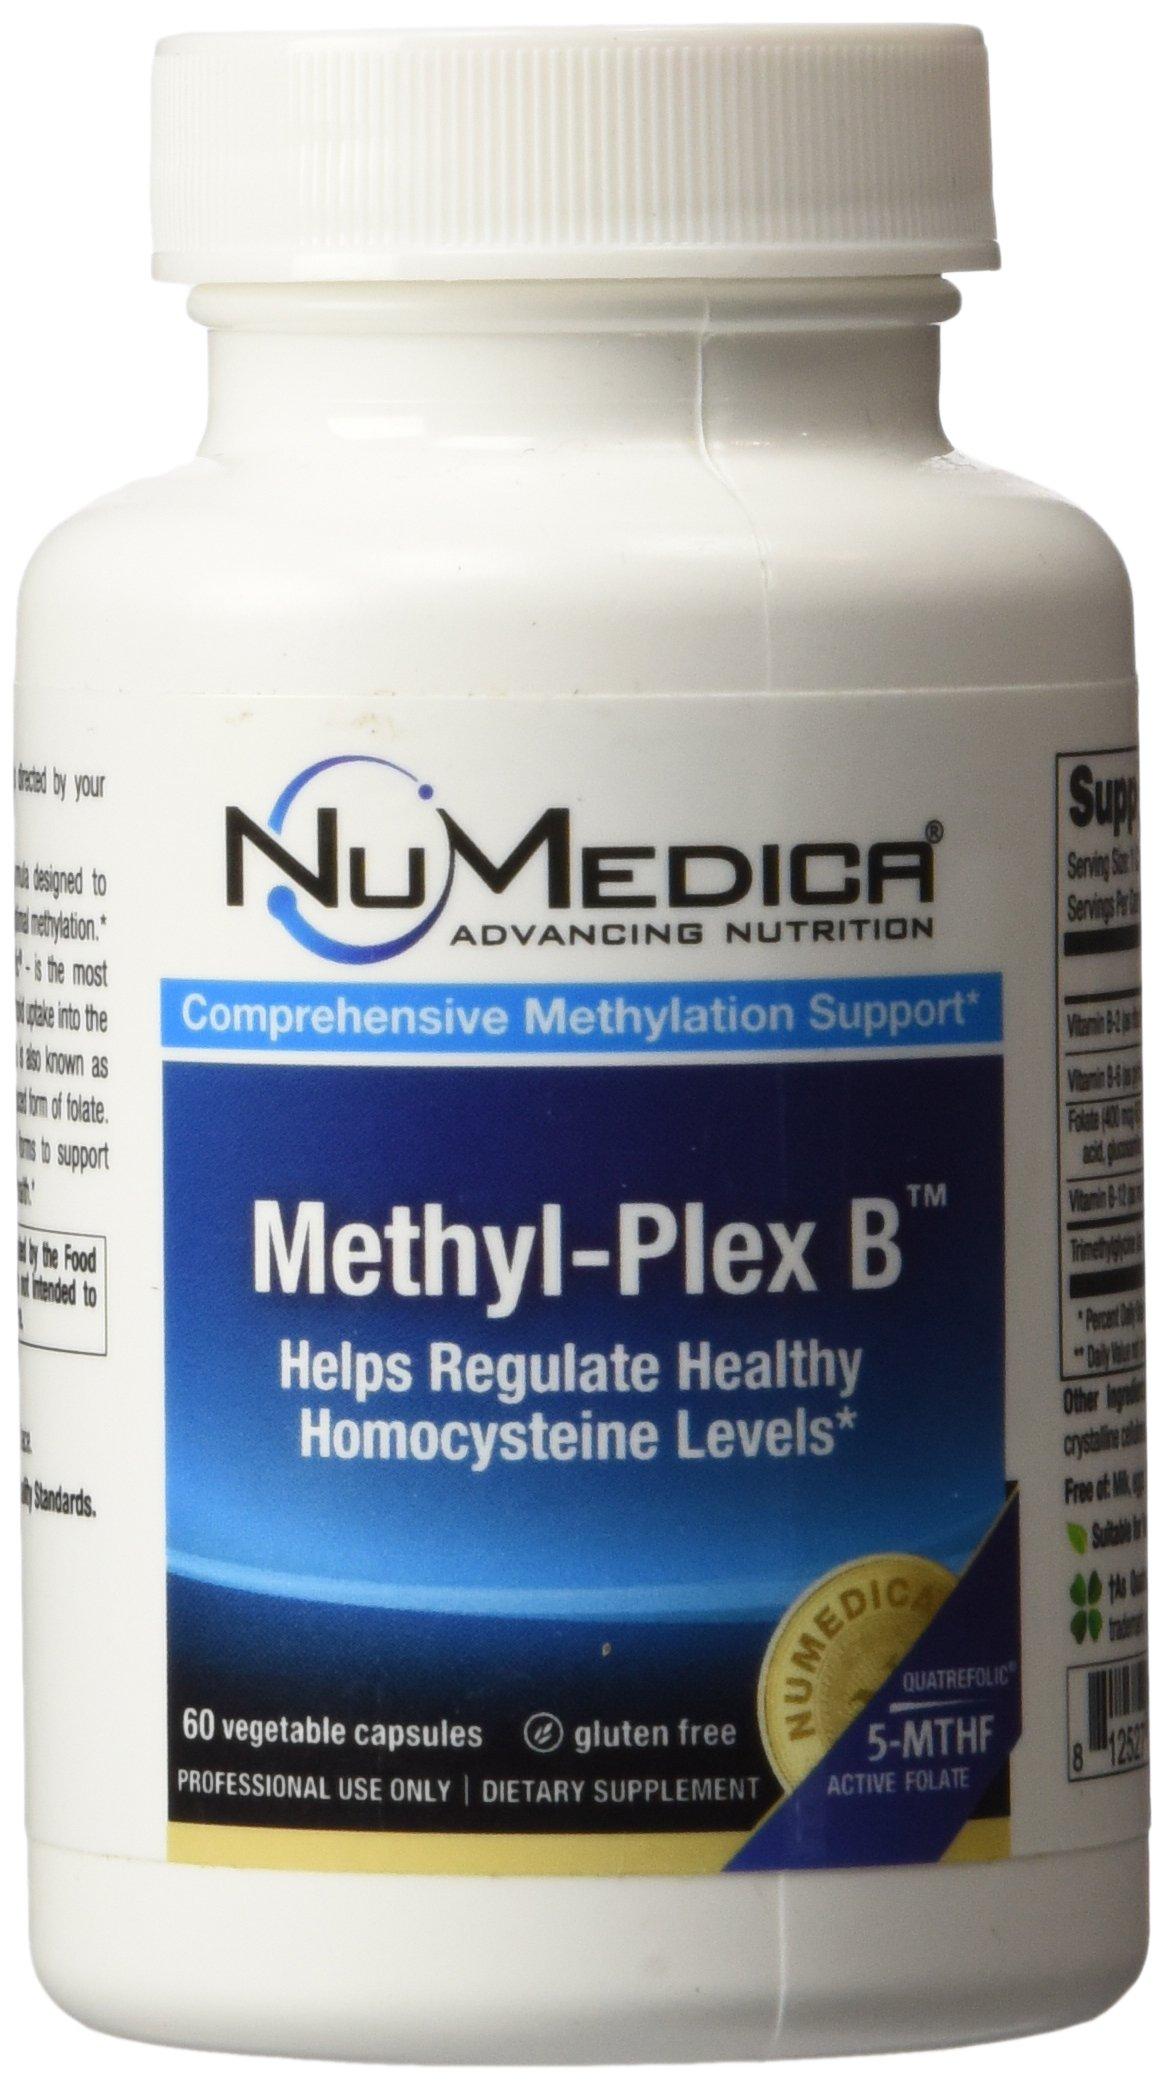 NuMedica Methyl-Plex B 60 Vegetable Capsules by NuMedica